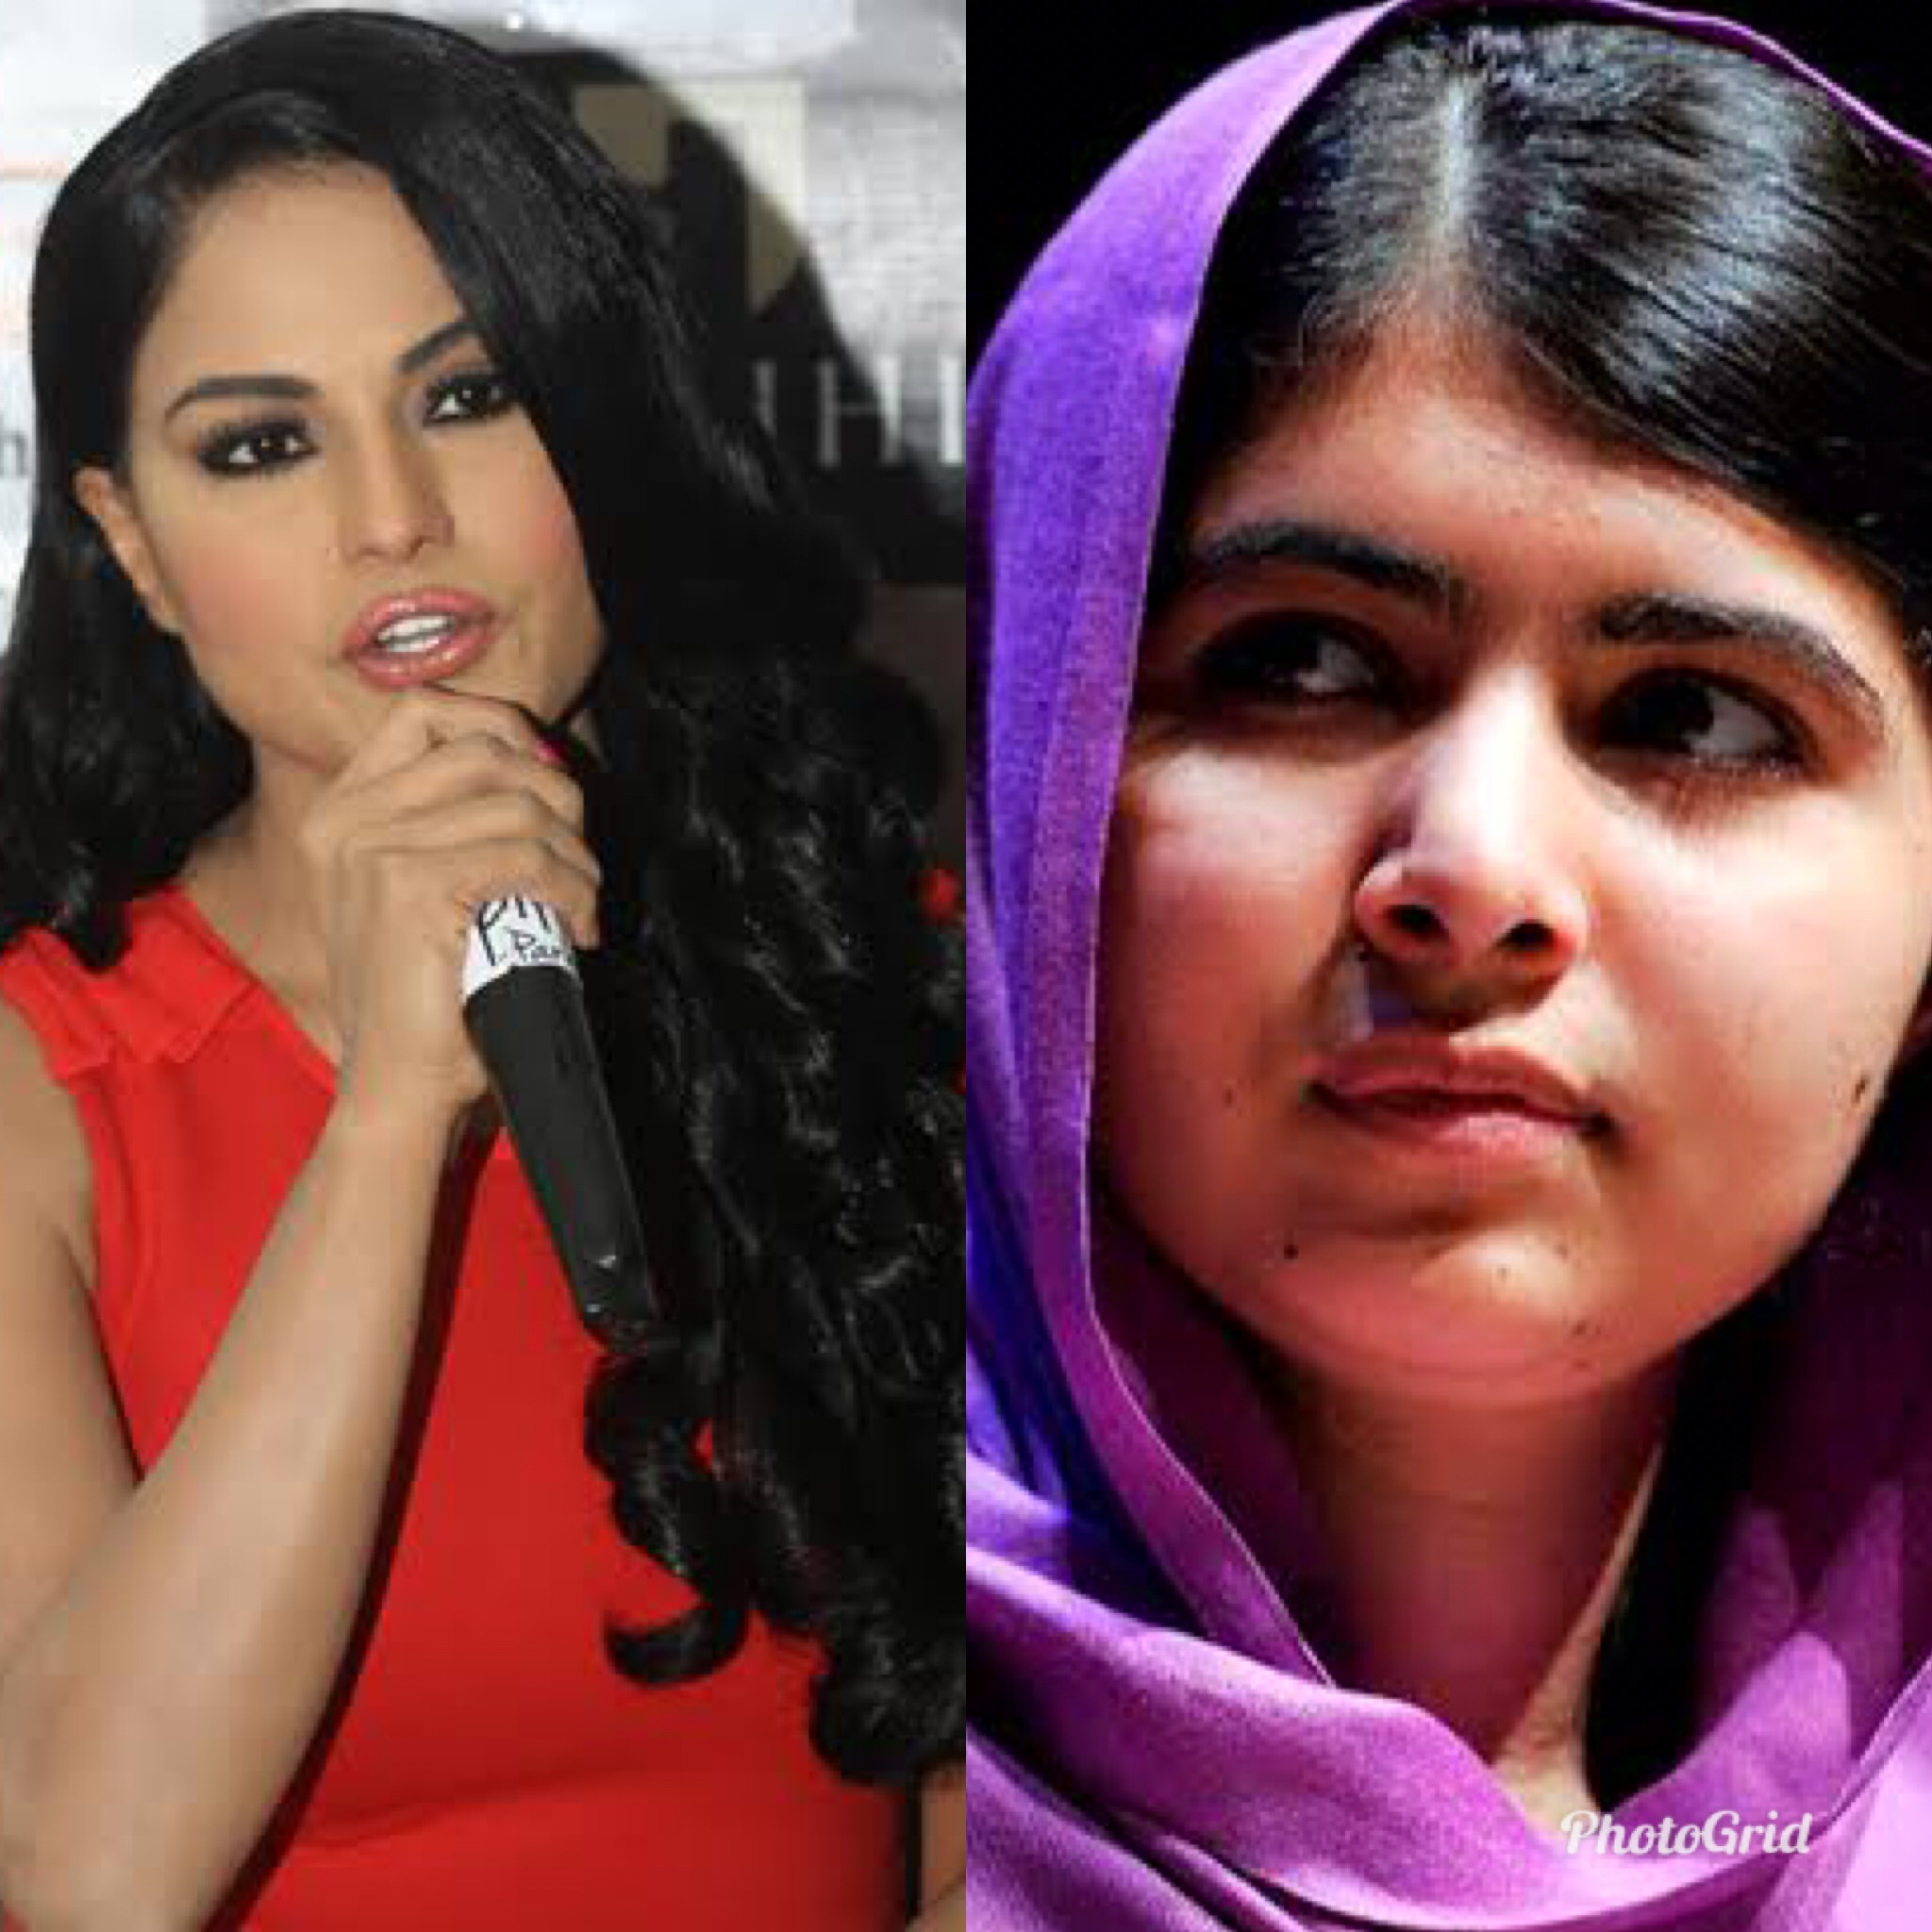 Anaa's Altamash, Usman Mukhtar is pairing up with Sara khan